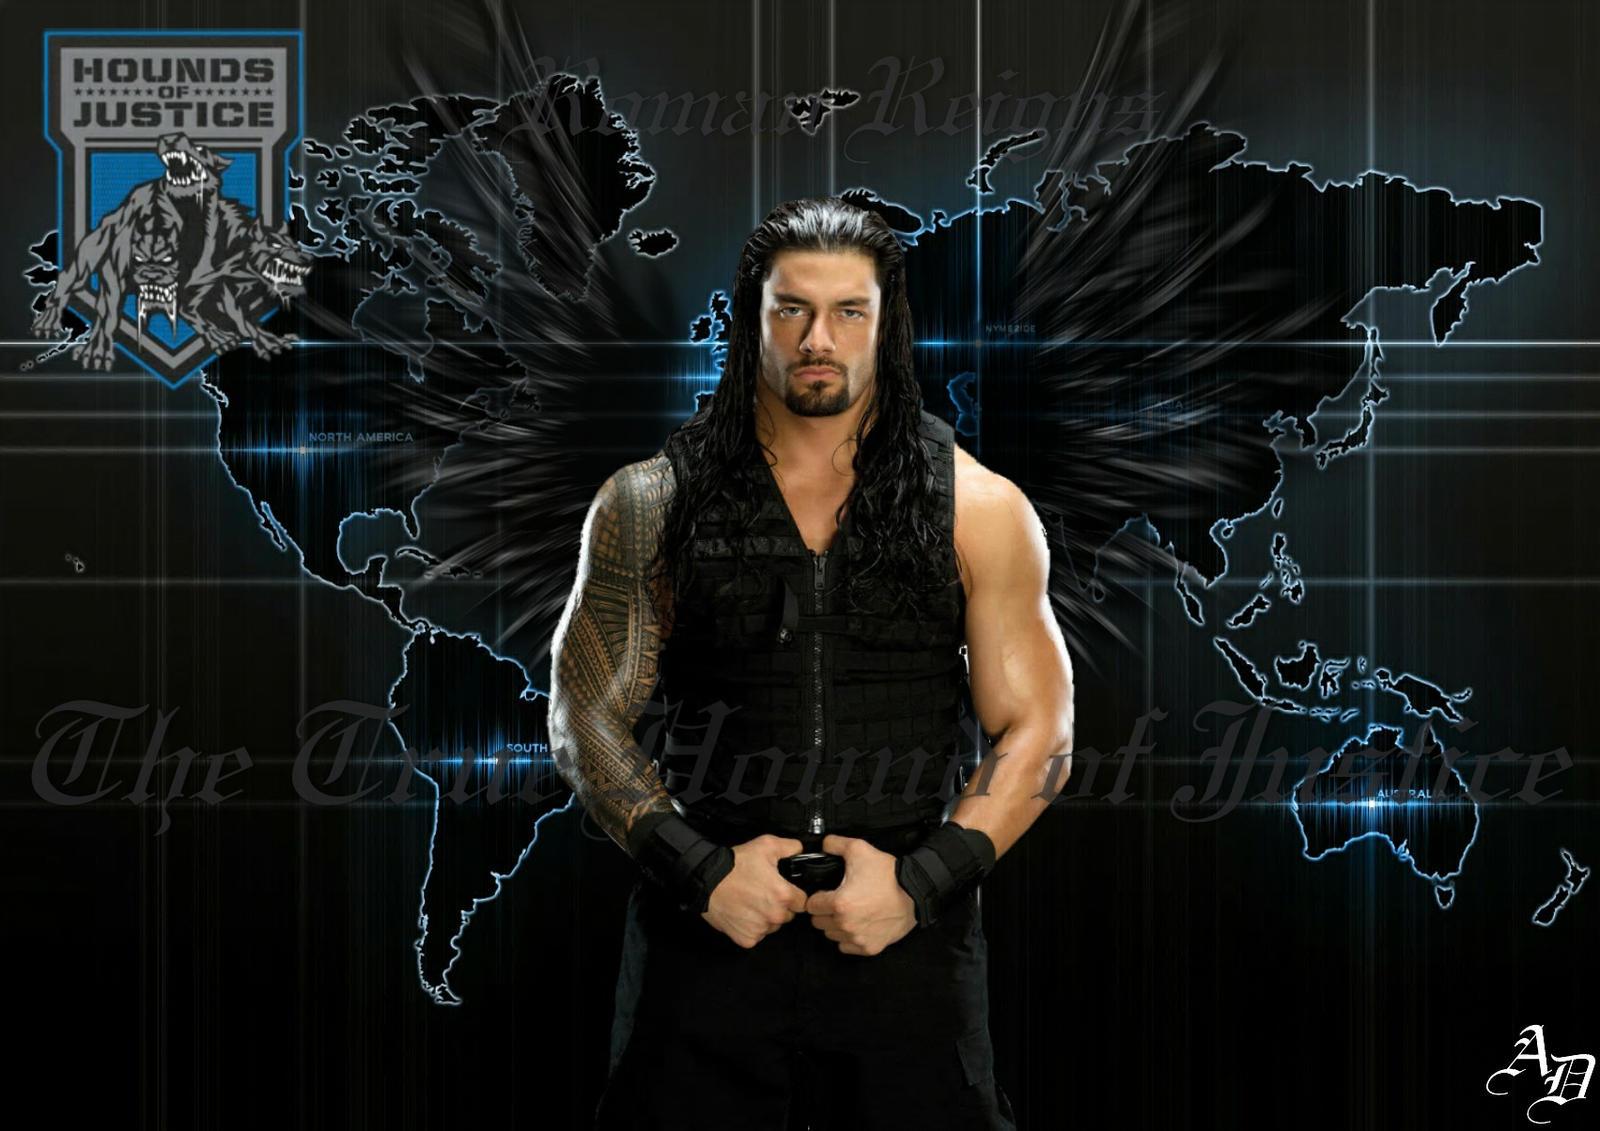 WWE Roman Reigns Wallpaper By ShizuLeinXD On DeviantArt